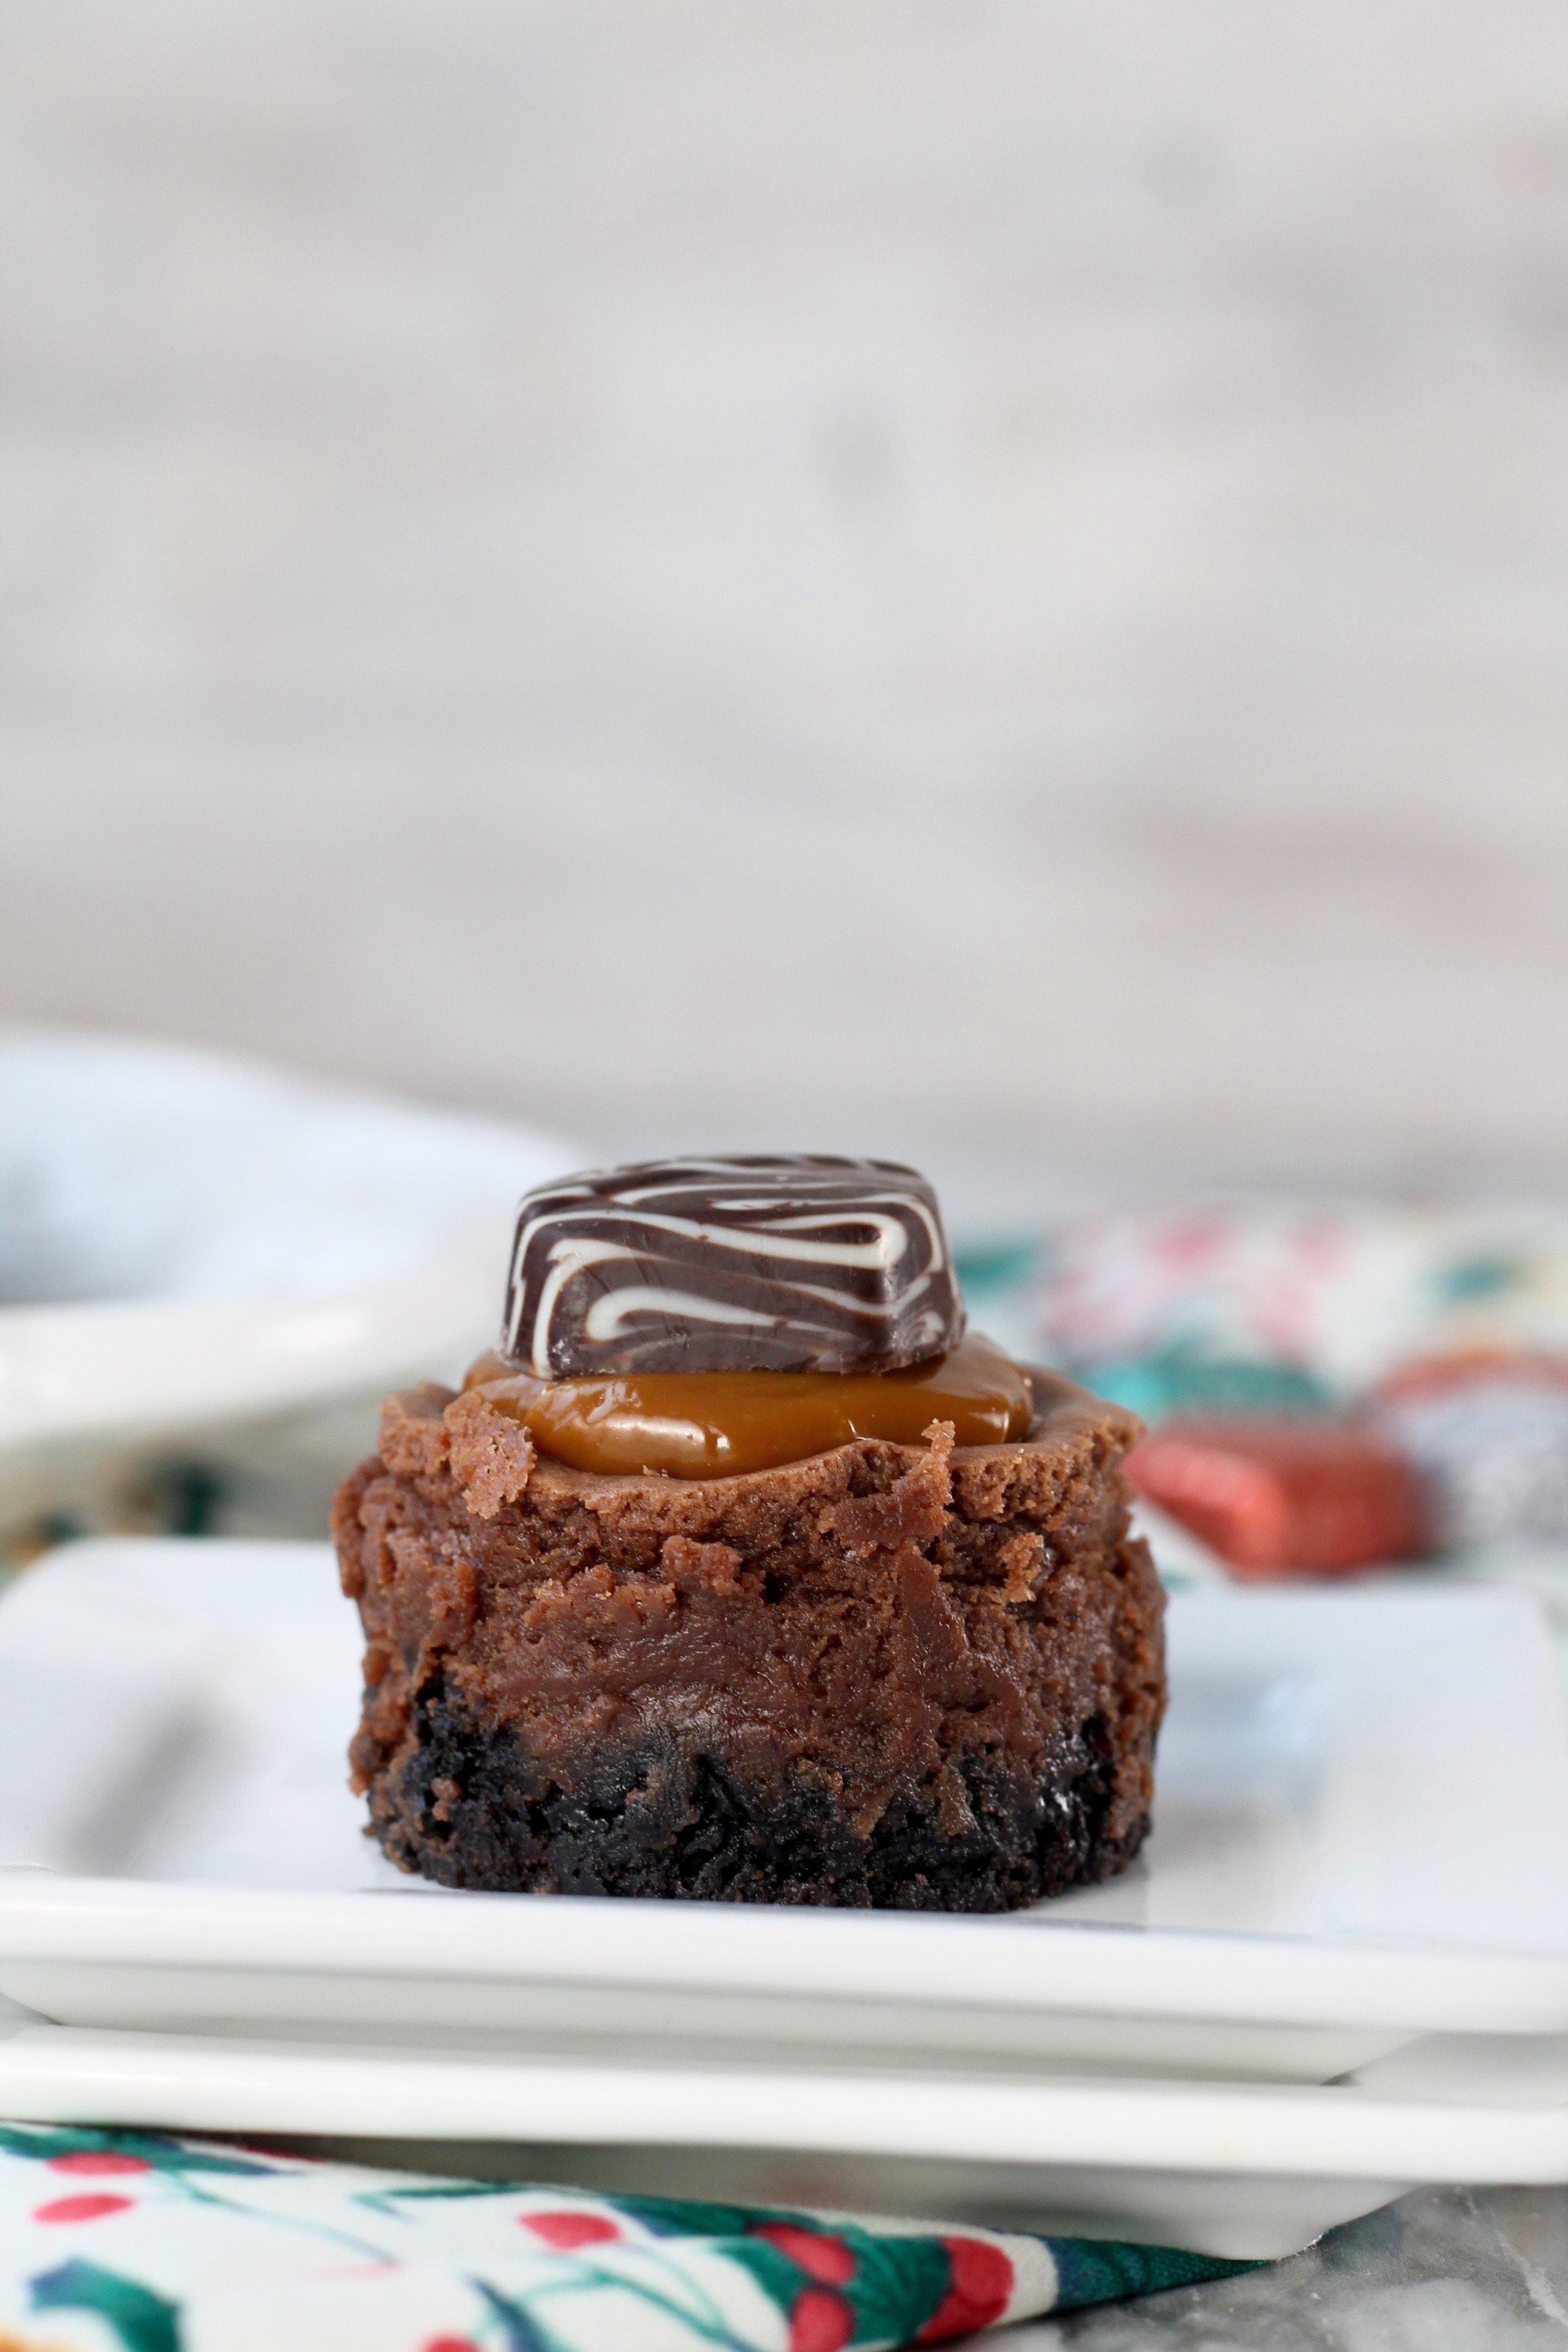 Mini Dove Cheesecake with dulce de leche caramel and chocolate cheesecake